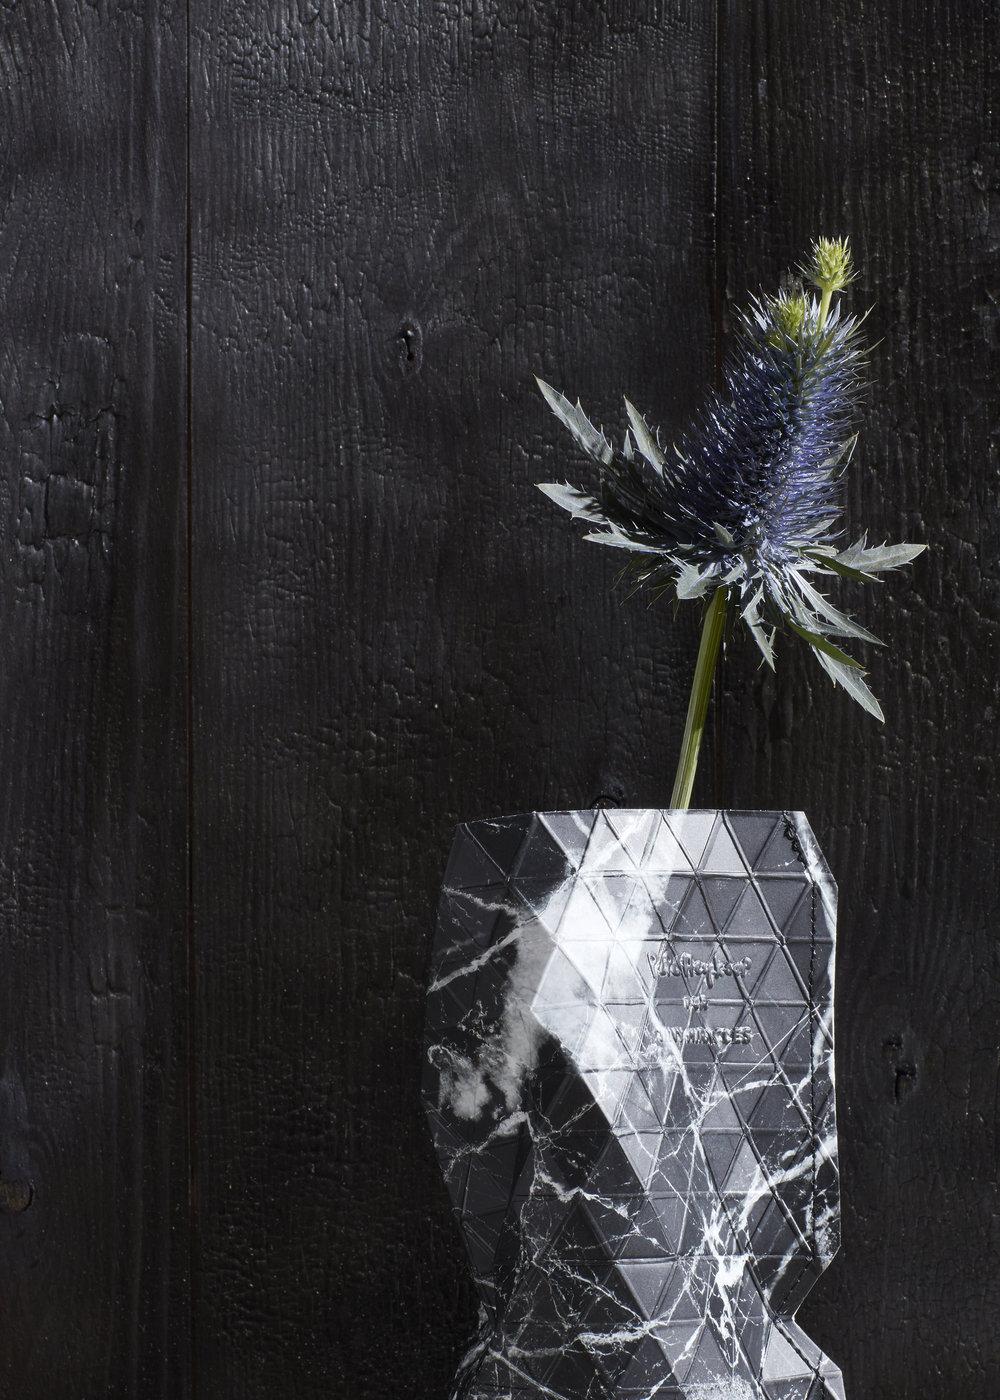 18.06.2018_Flowers Test_LSR_044040155.jpg